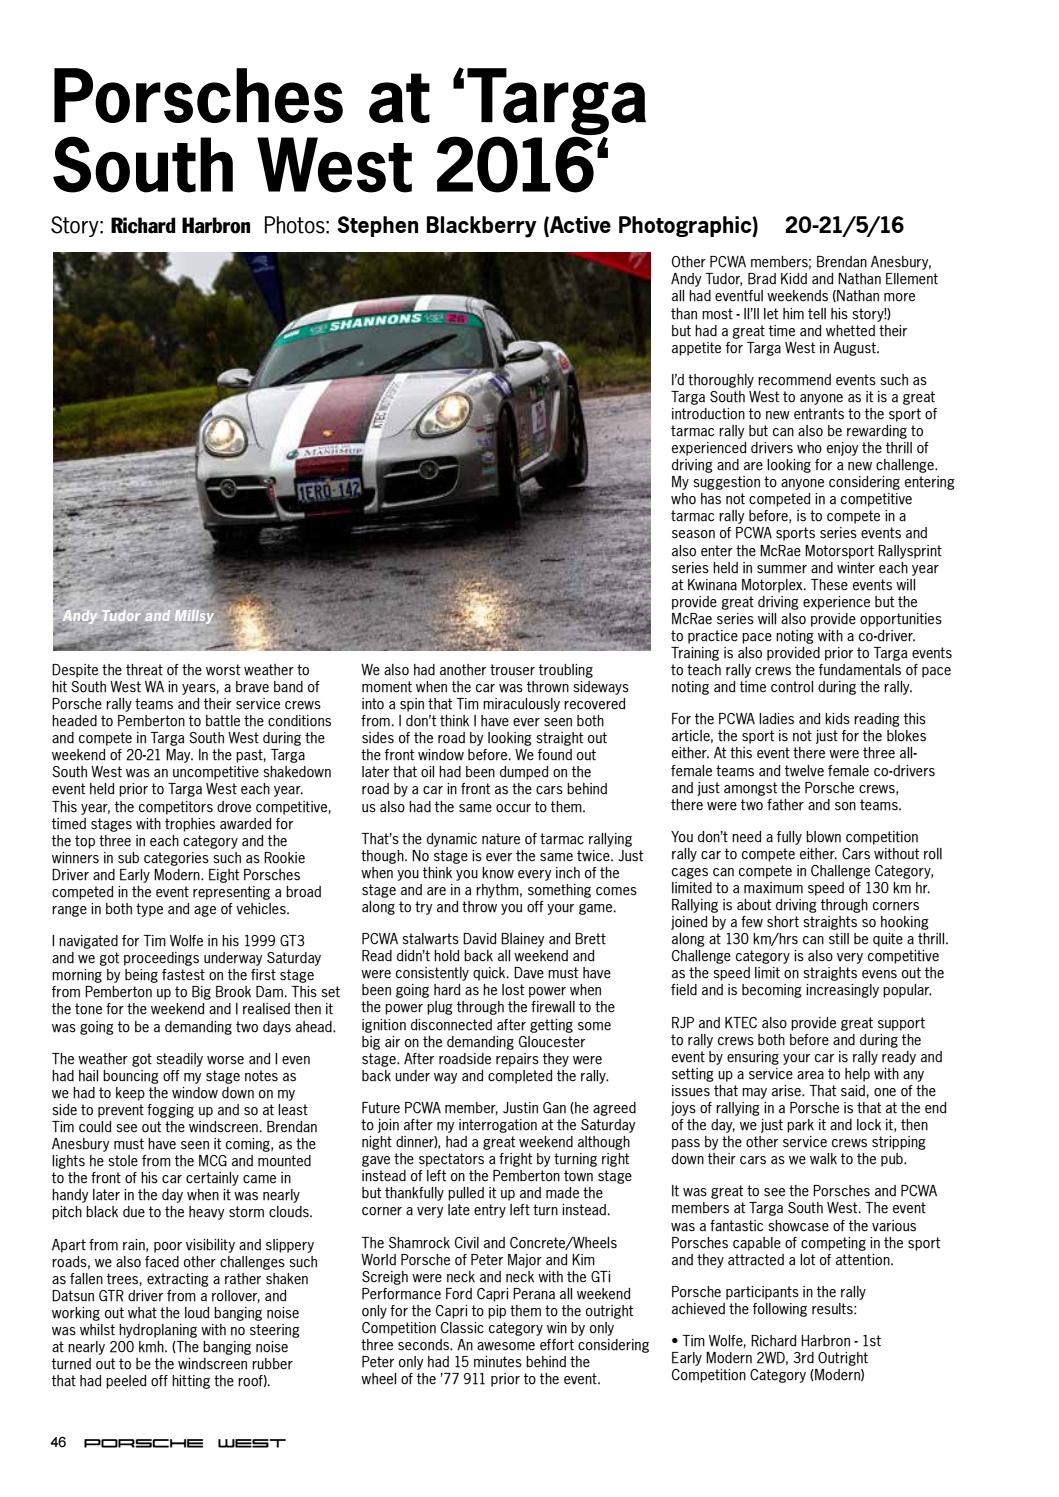 Porsche West 2 - 2016 by Composite Colour - issuu